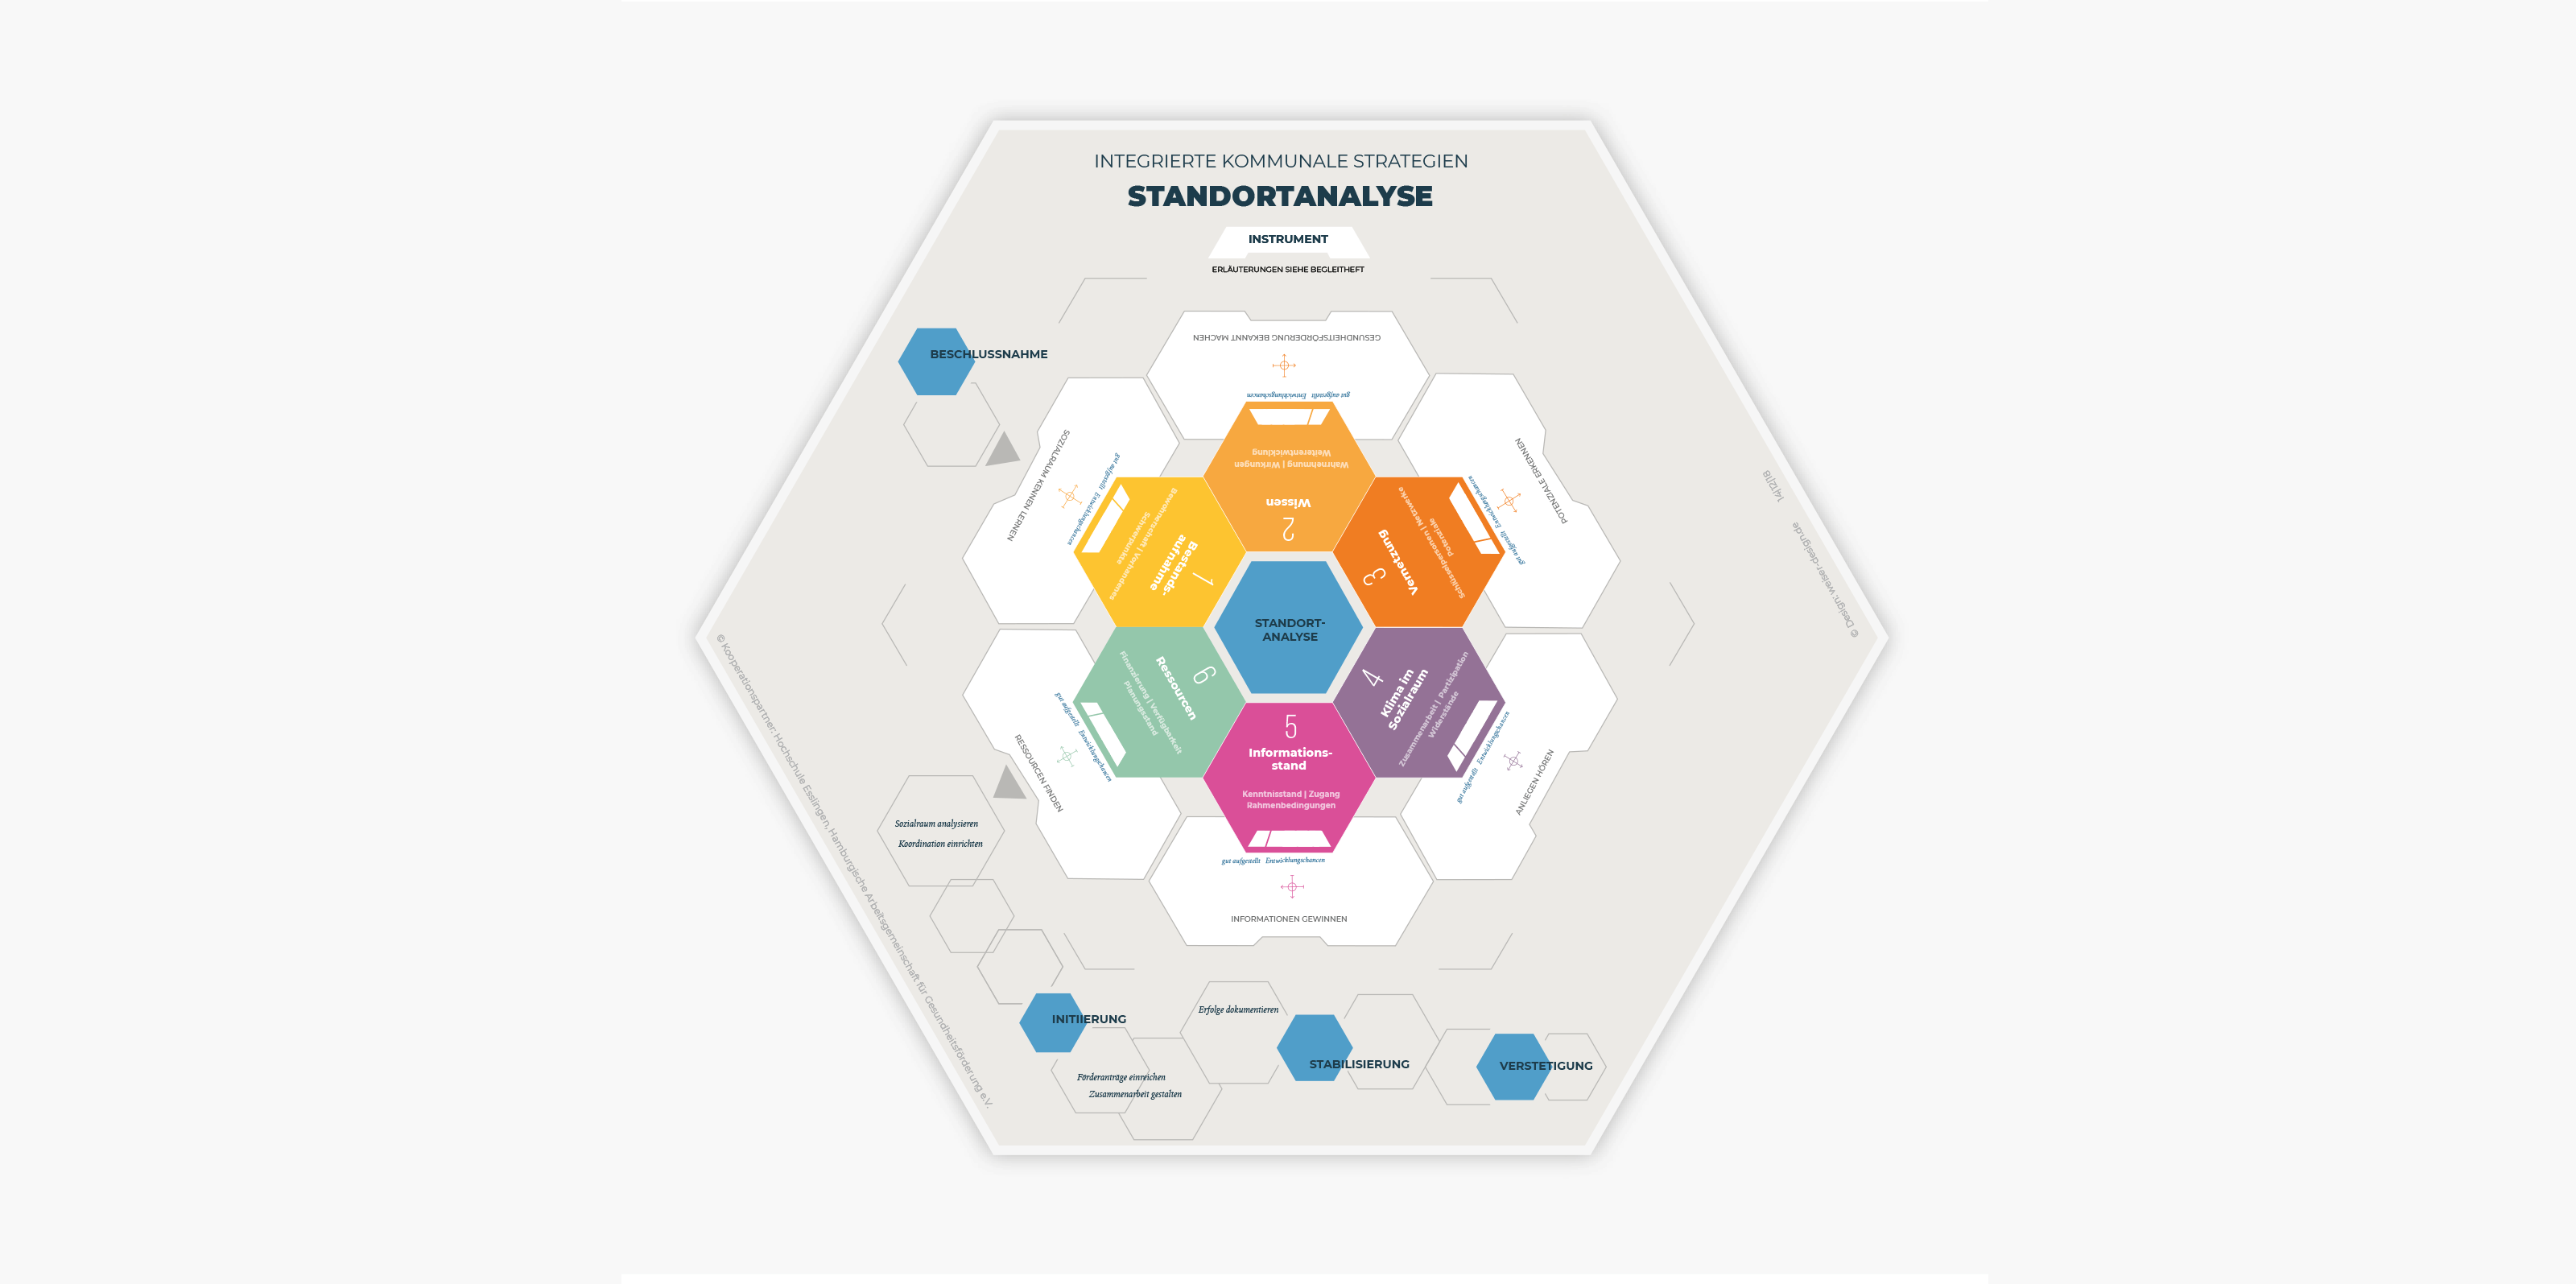 Design Konzept Standard Analyse Tool Corporate Design, Hochschule Esslingen, Tool Entwicklung, Print Design, Fragekarten